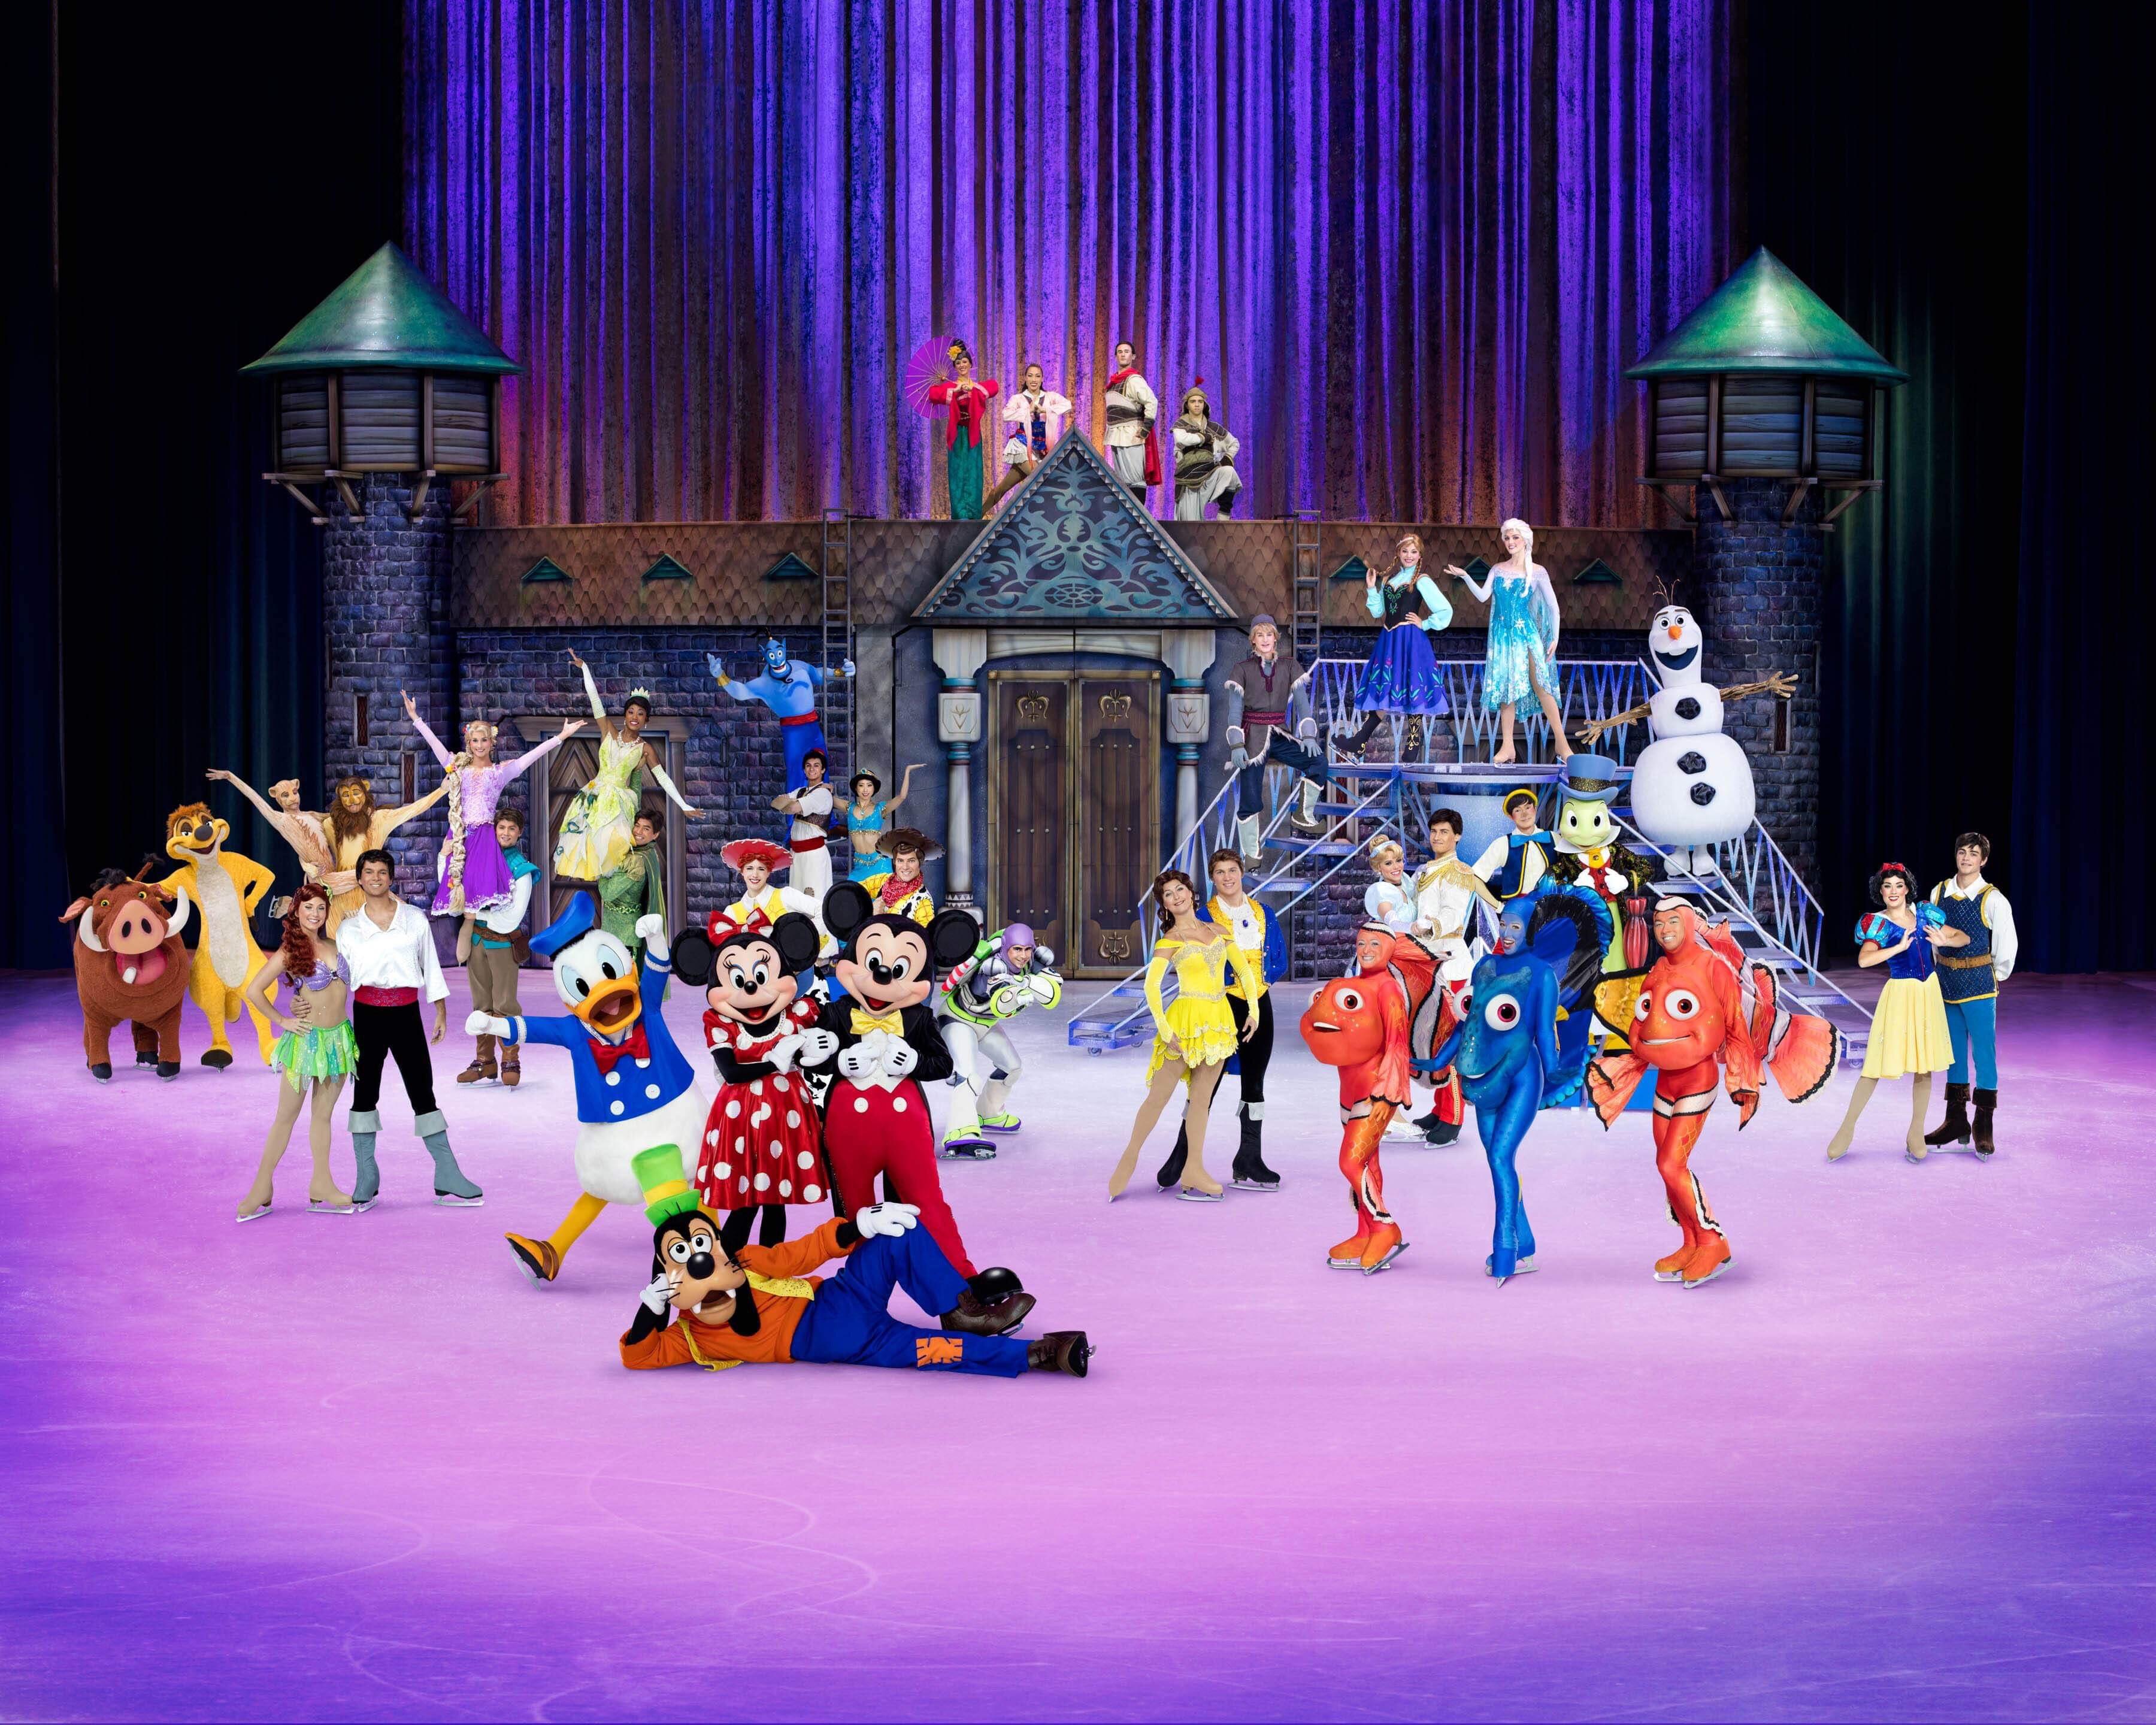 100 Years of Disney Magic on Ice /  Oh Fiddle Dee Dee